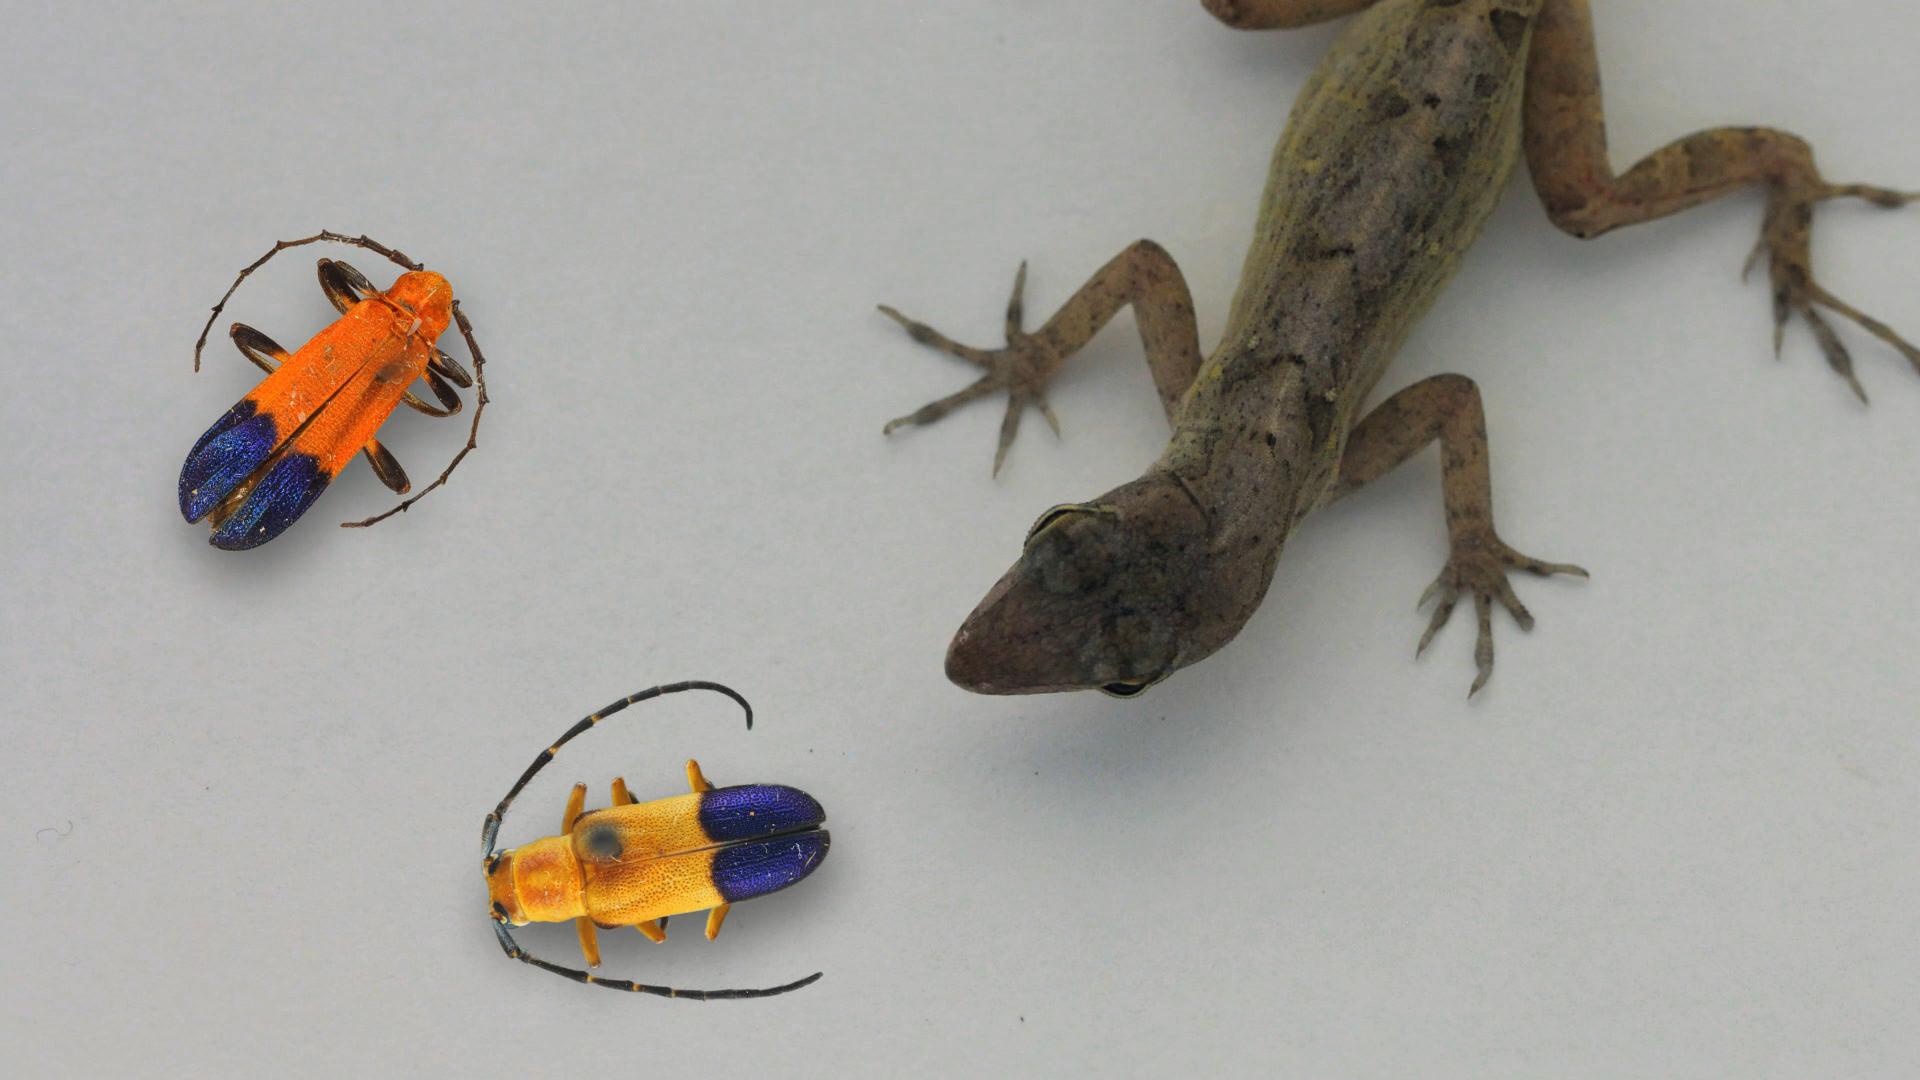 Beetle Bluffs_Kiwi and beetles4.jpg